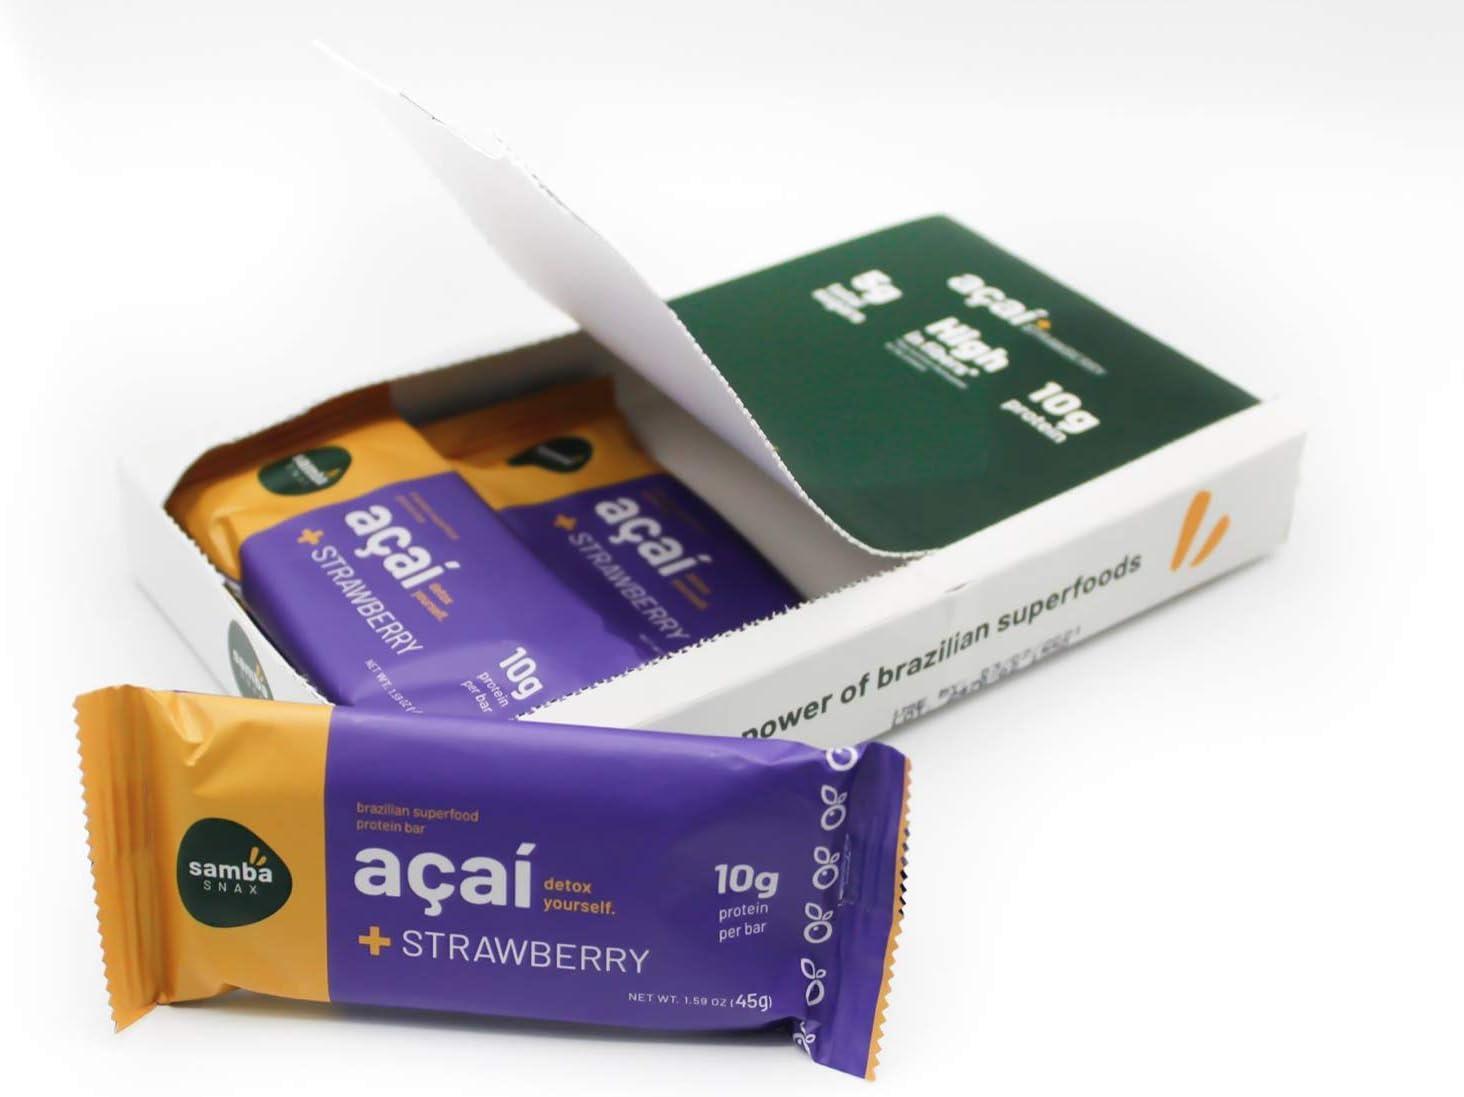 SambaSnax Keto-Friendly Protein Bars (6 Pack), Healthy Snacks Acai & Strawberry, Energy Booster, Low Sugar Brazilian Superfood